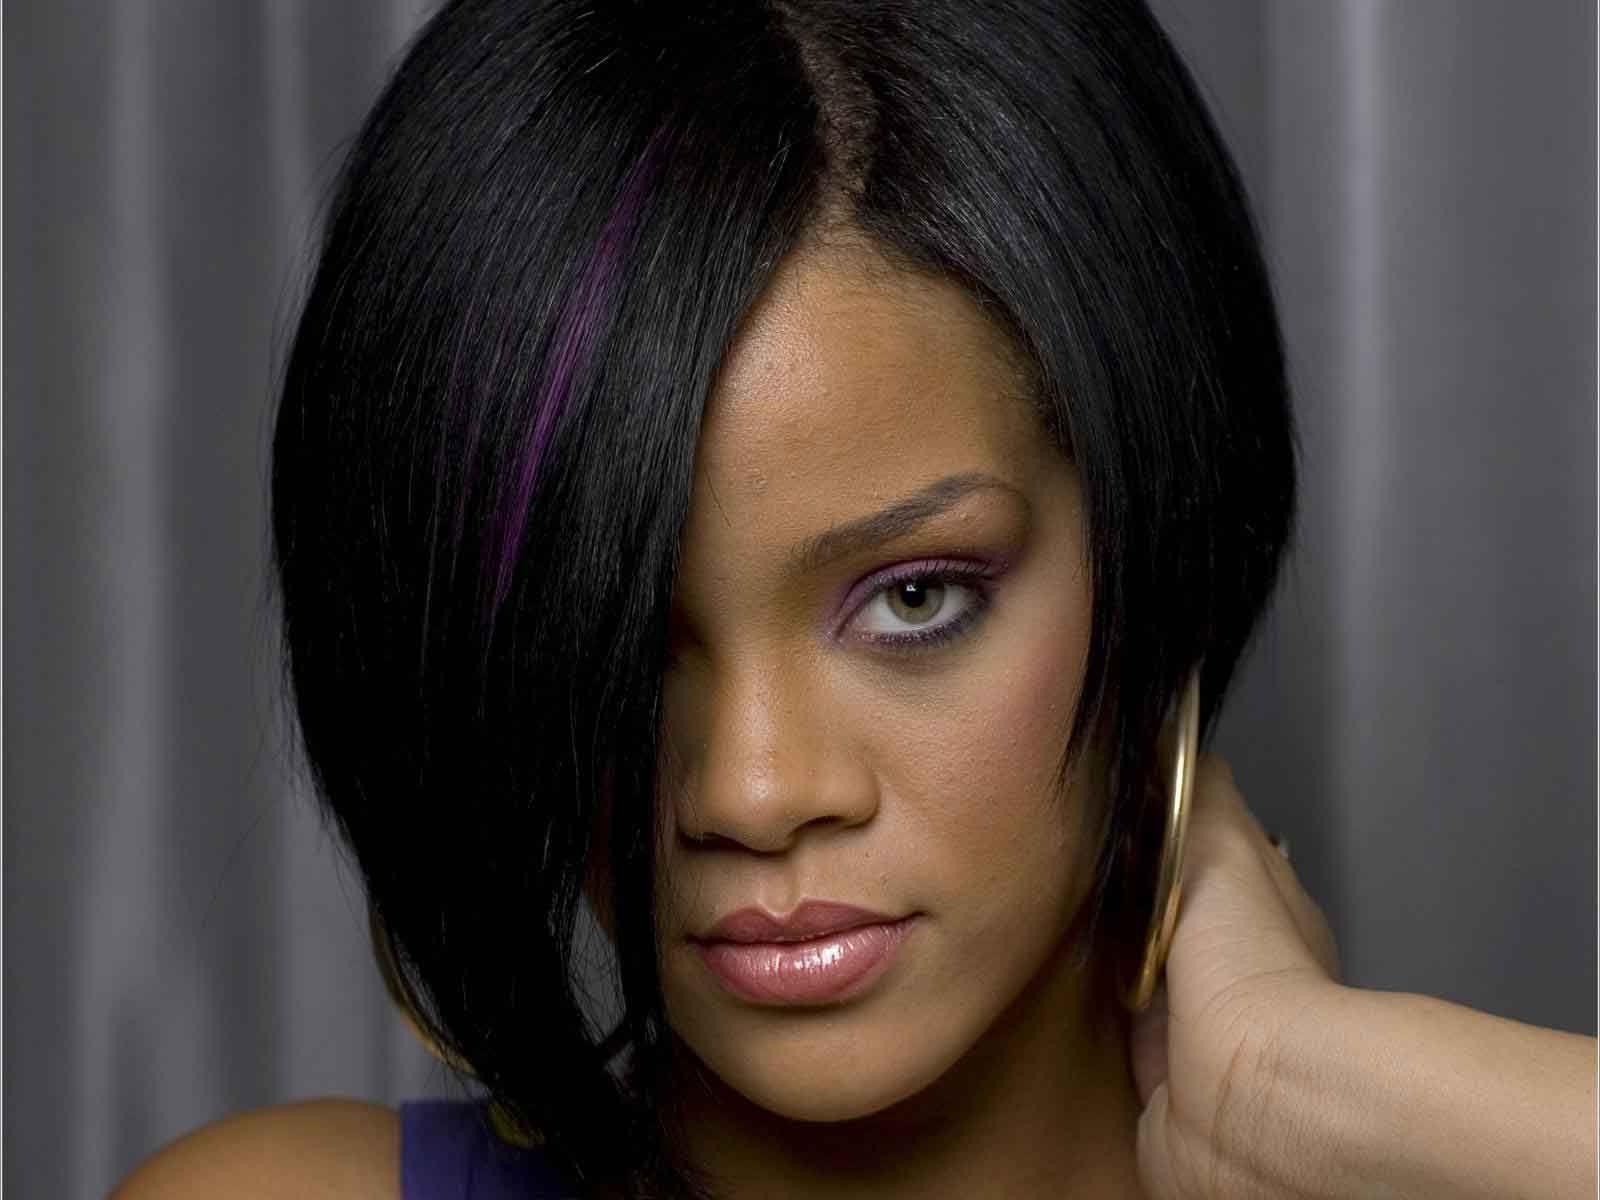 Singger Rihanna Long Bob Haircuts For Party 2012 Sheplanet Bob Frisur Frisuren 2018 Wellige Frisuren